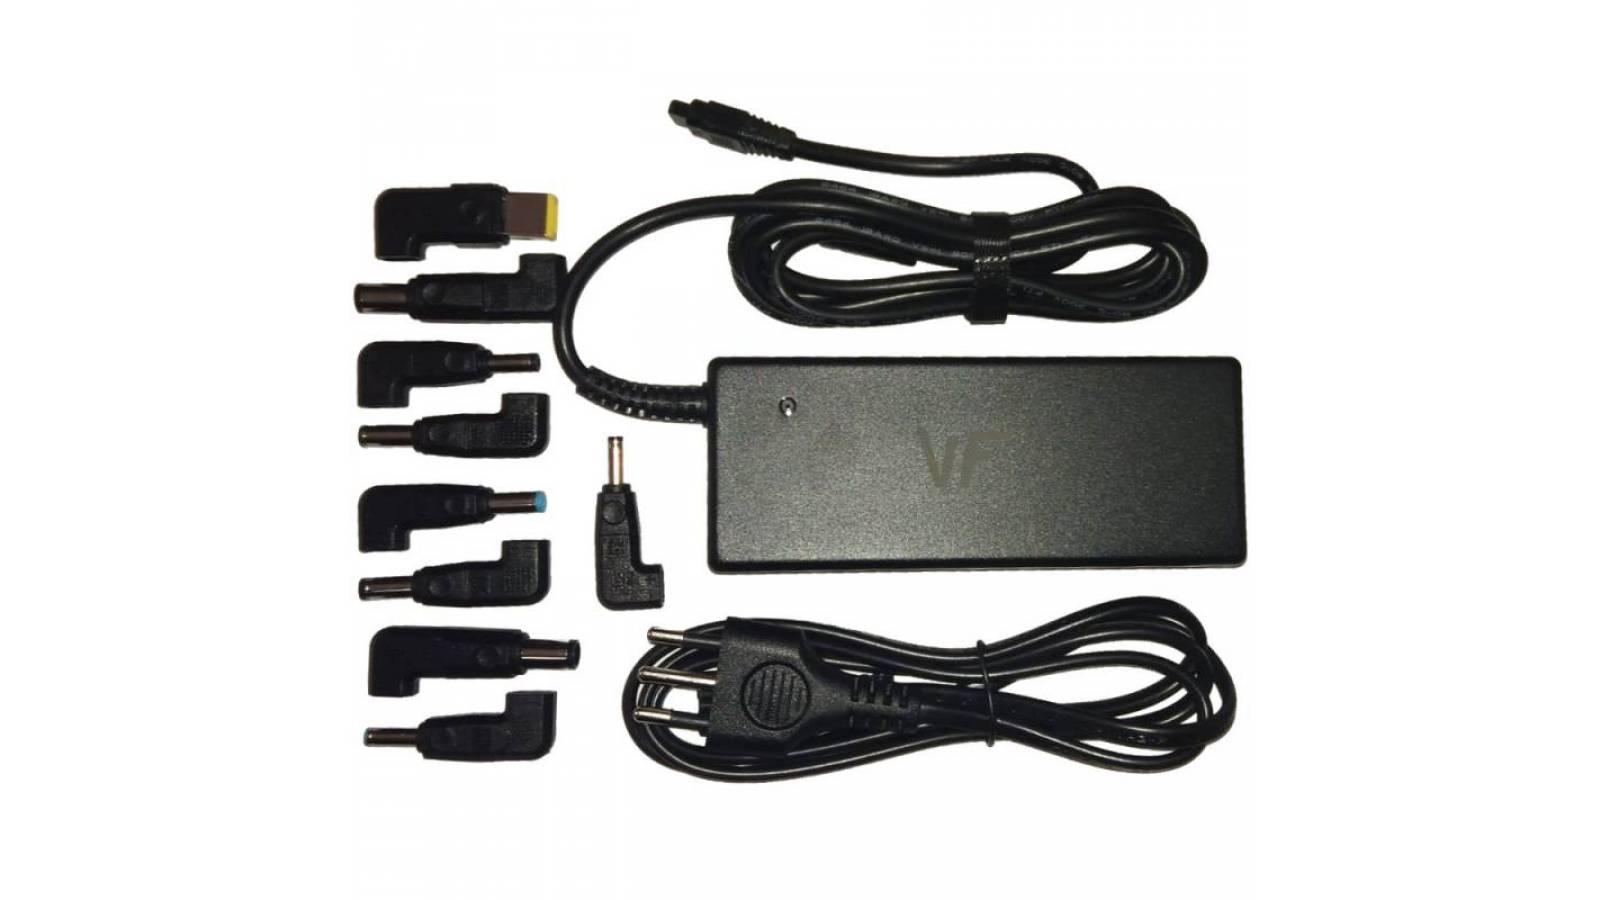 Cargador Notebook Universal 90w -9 puntas